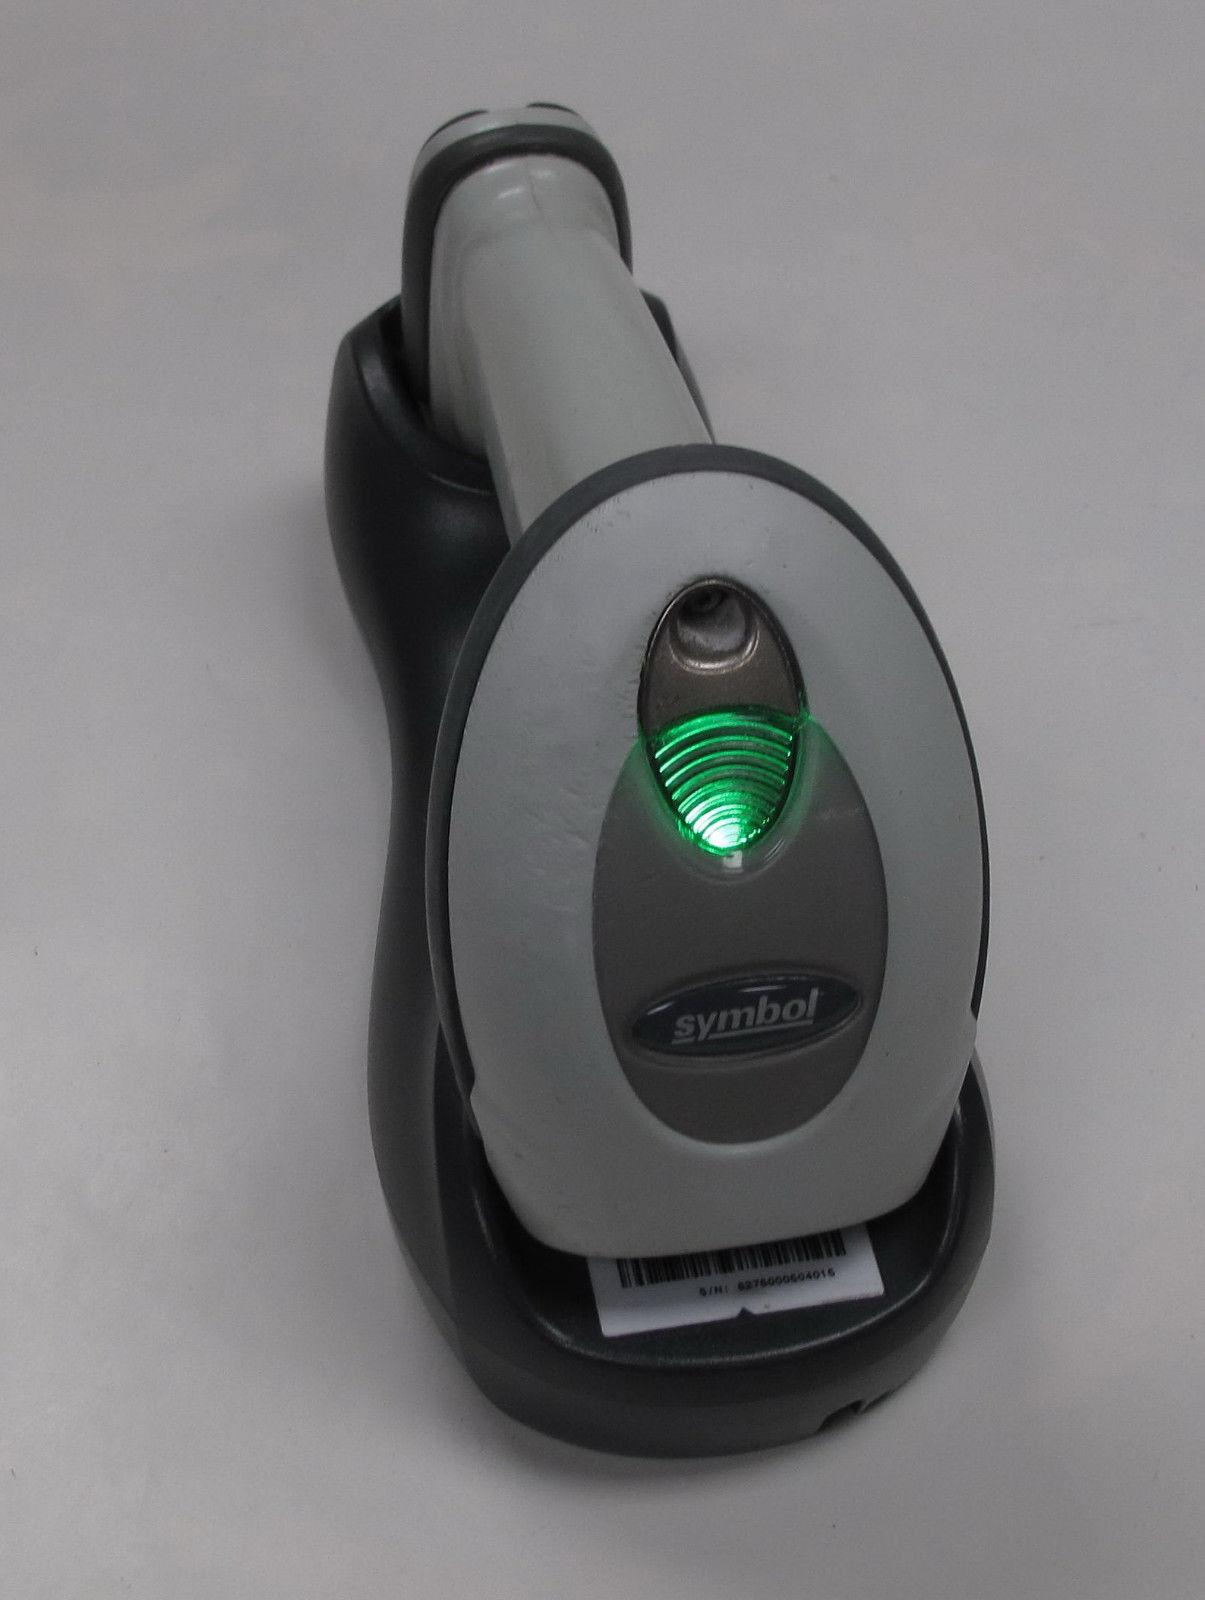 Motorola Symbol Barcode Scanner Ds6878 Usb And 41 Similar Items